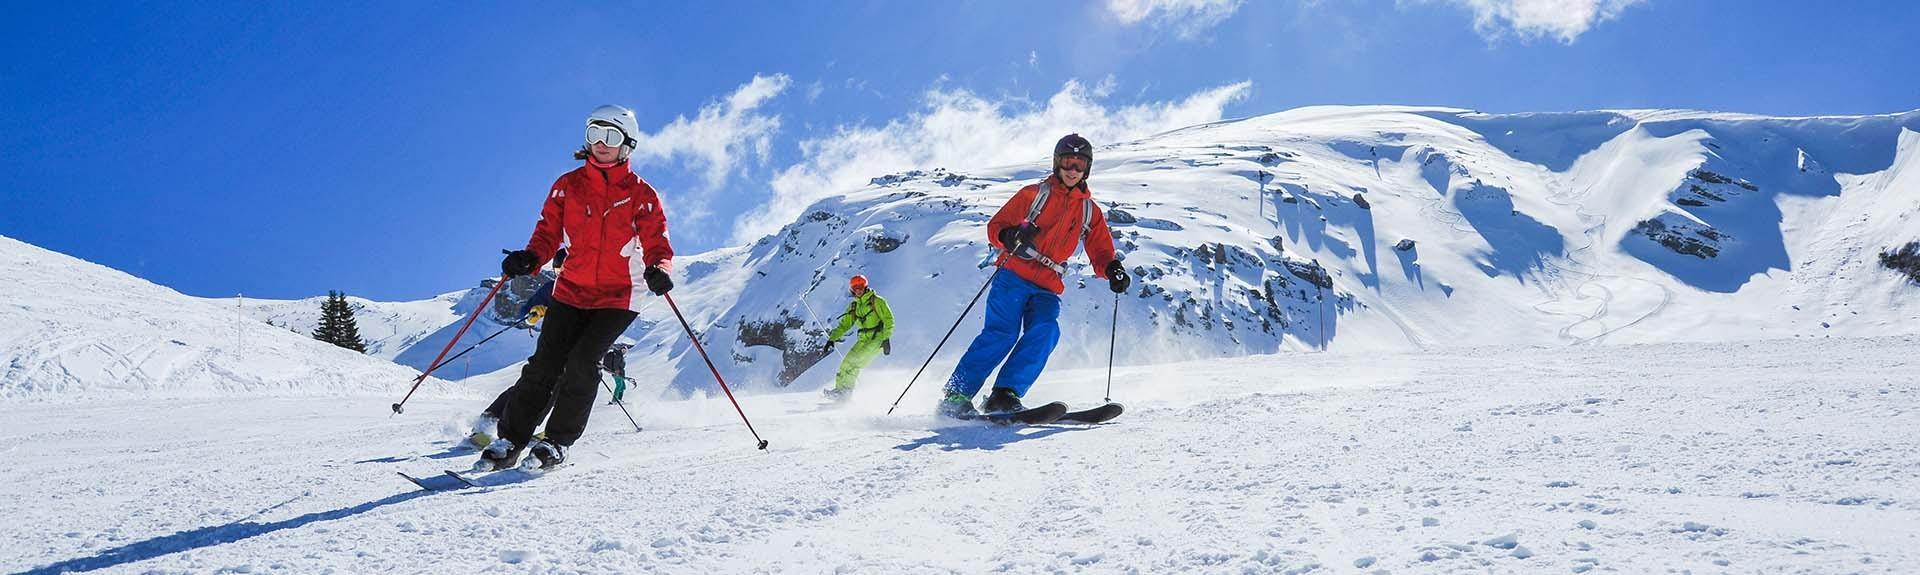 Skiën & glijsporten